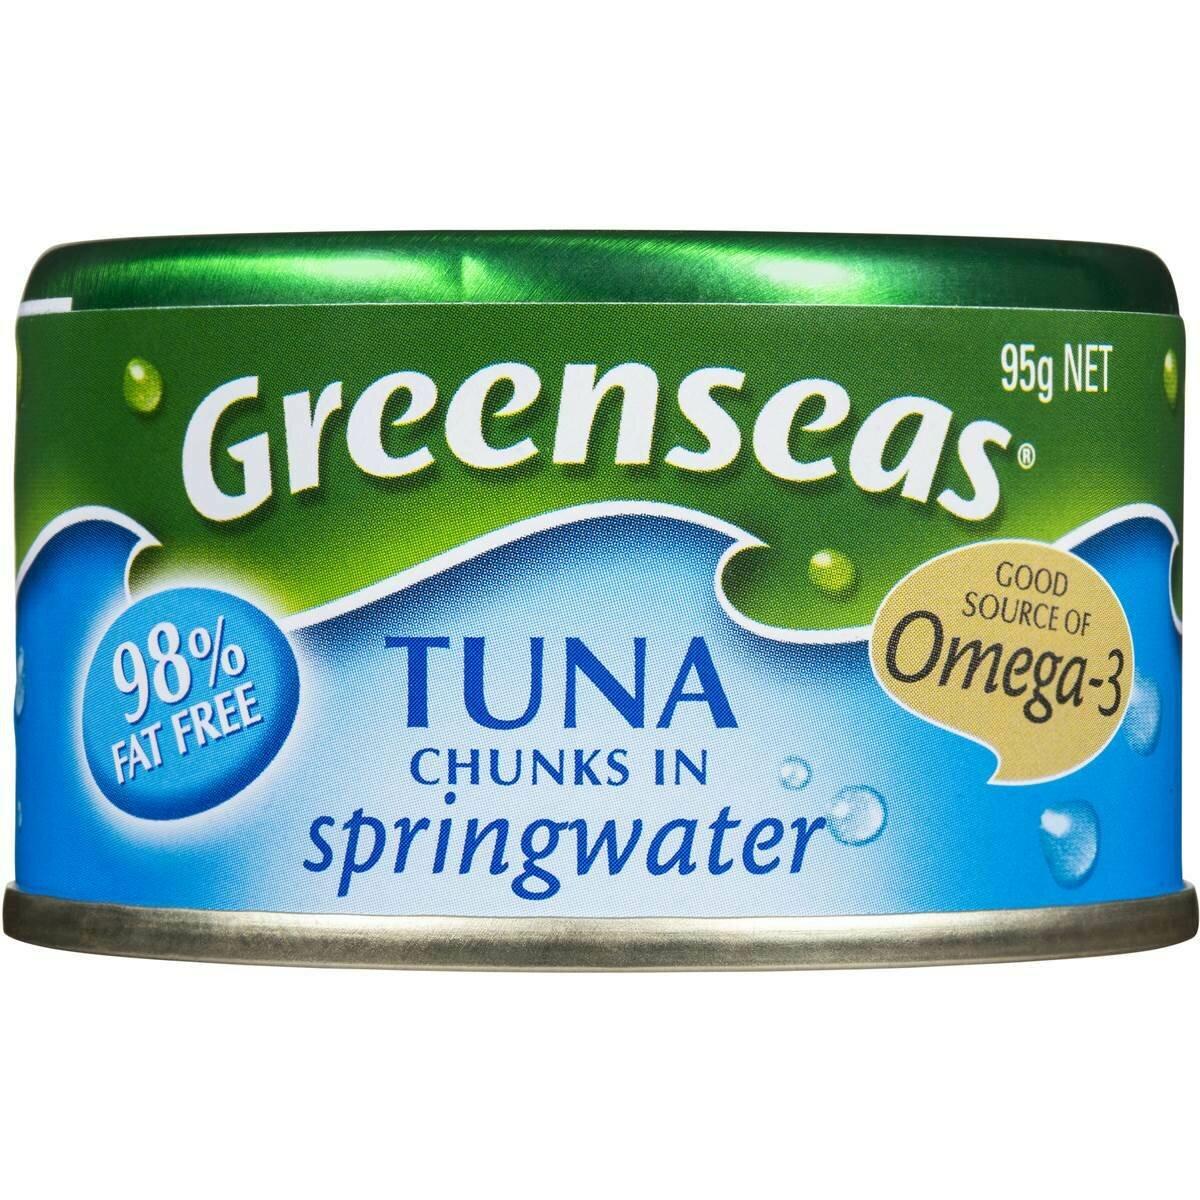 Greenseas Tuna Spring Water 95g